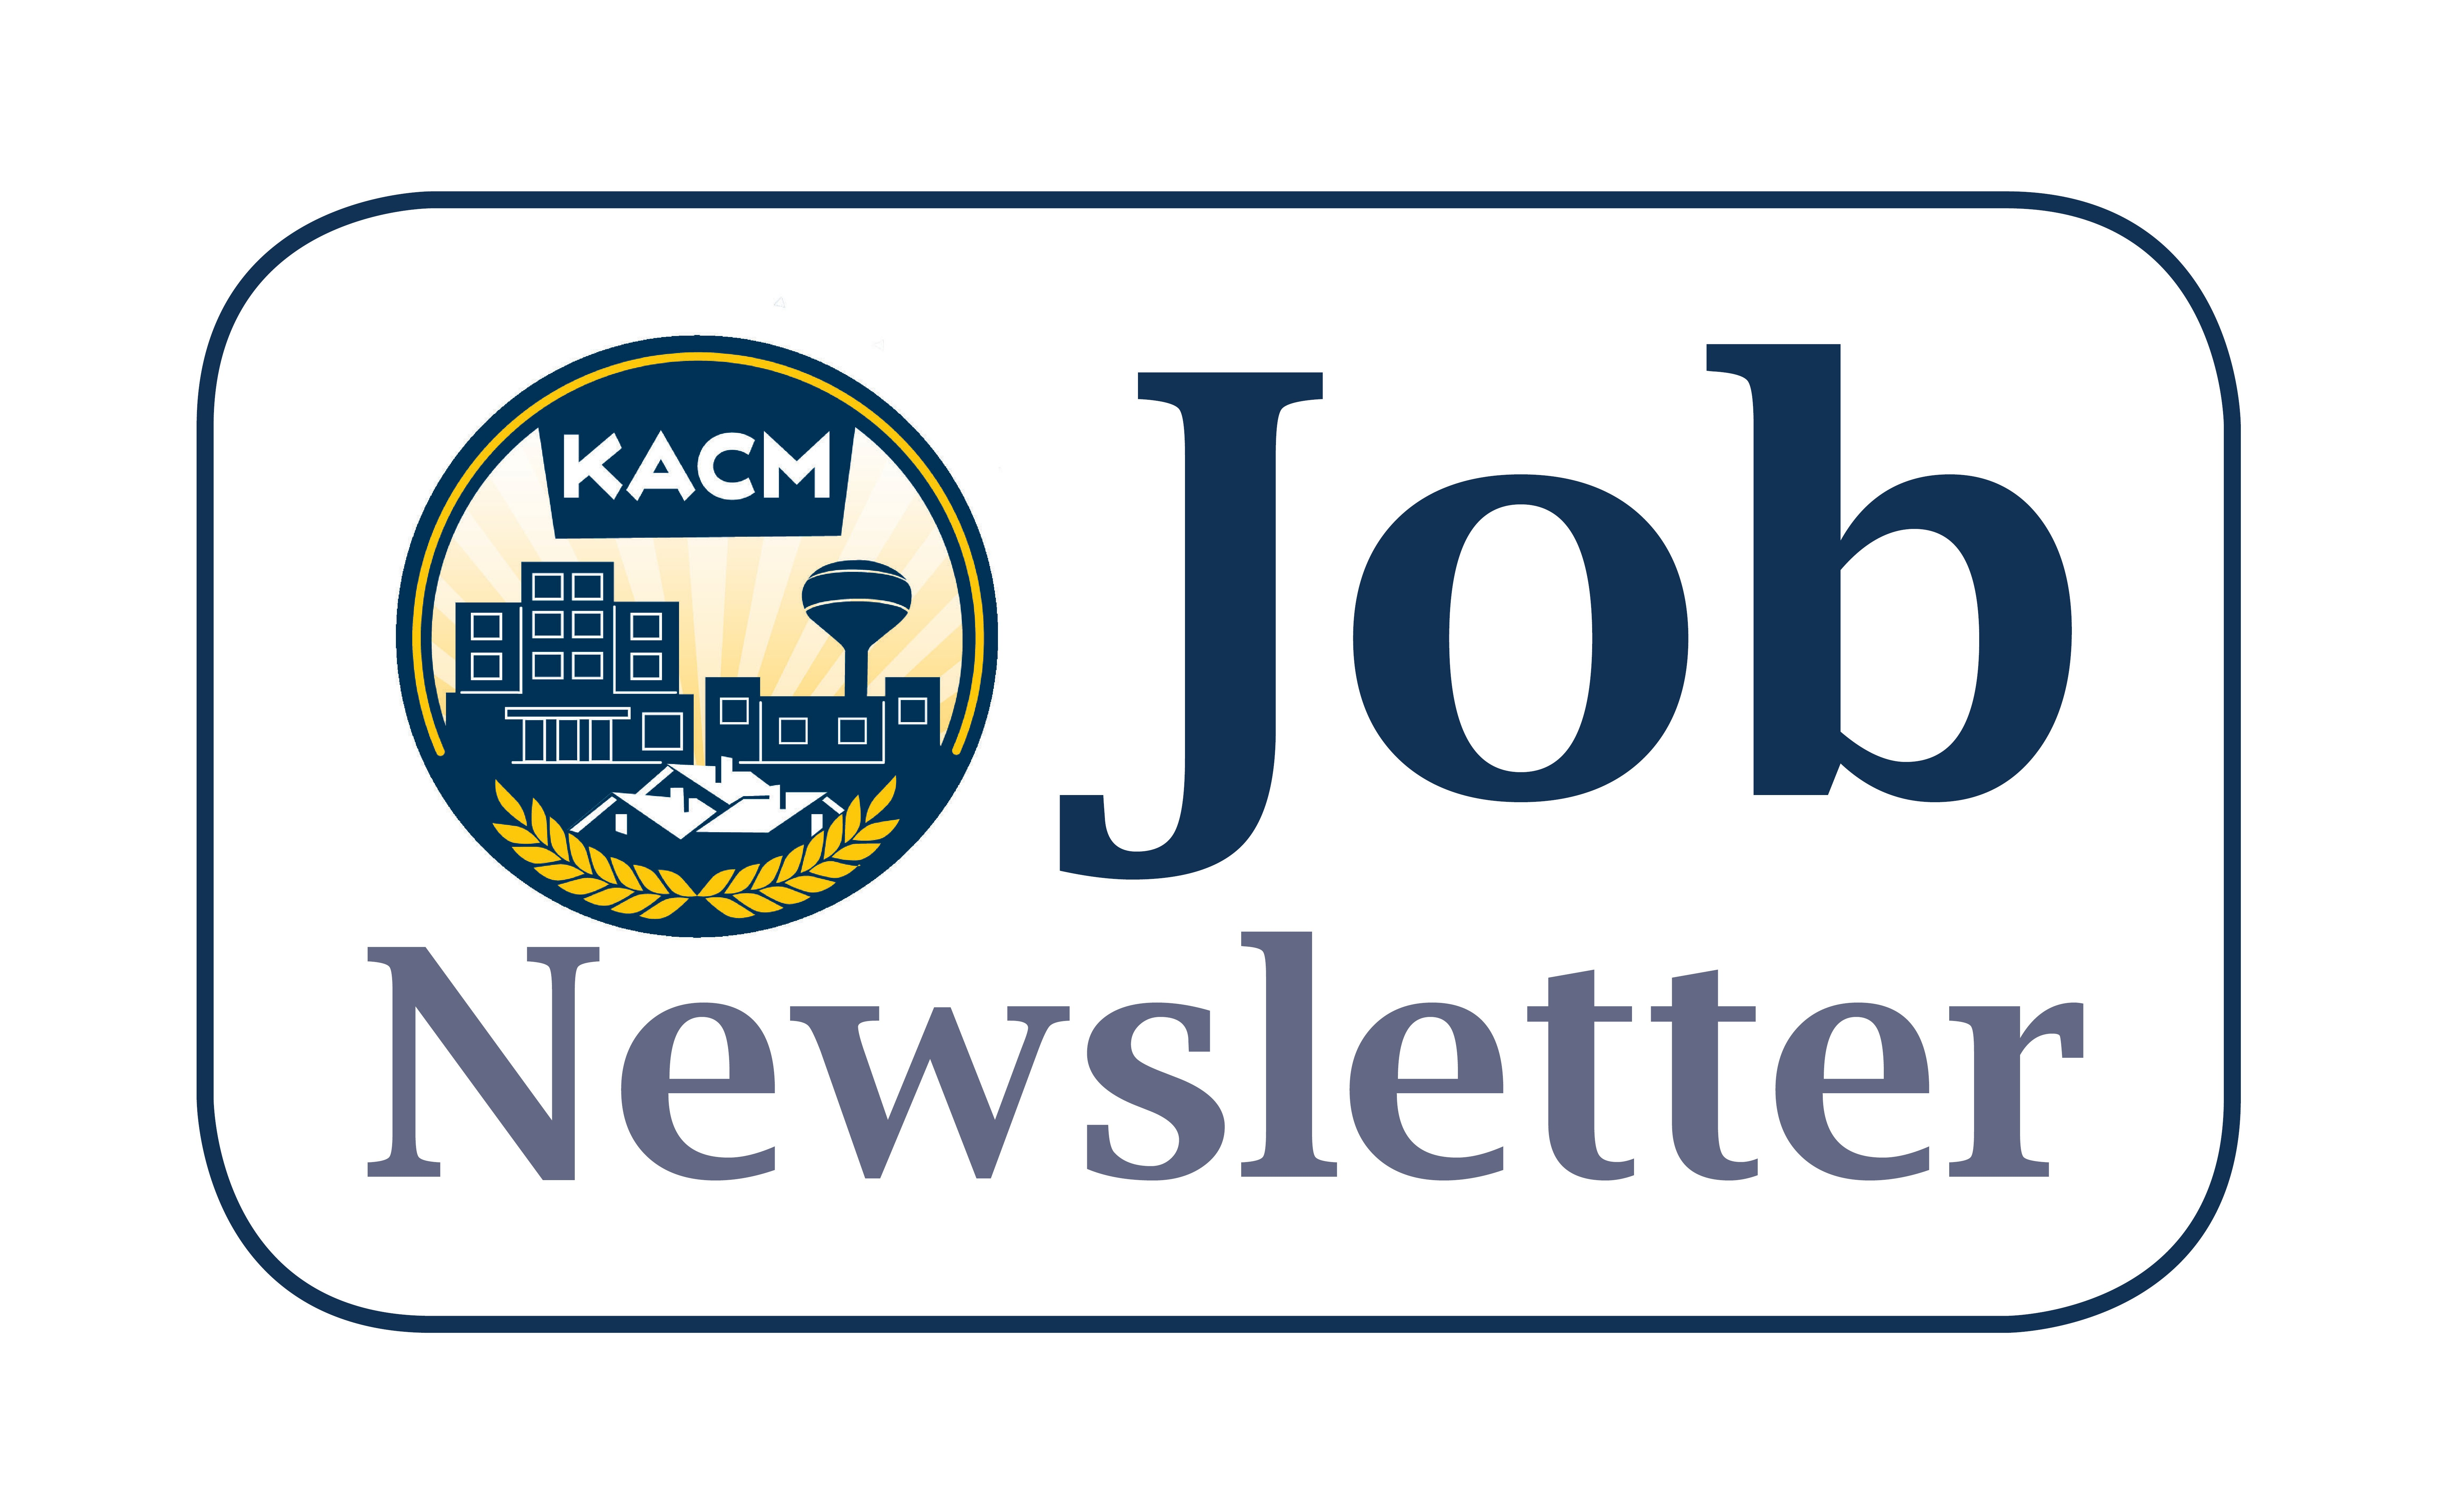 KACM Job Newsletter